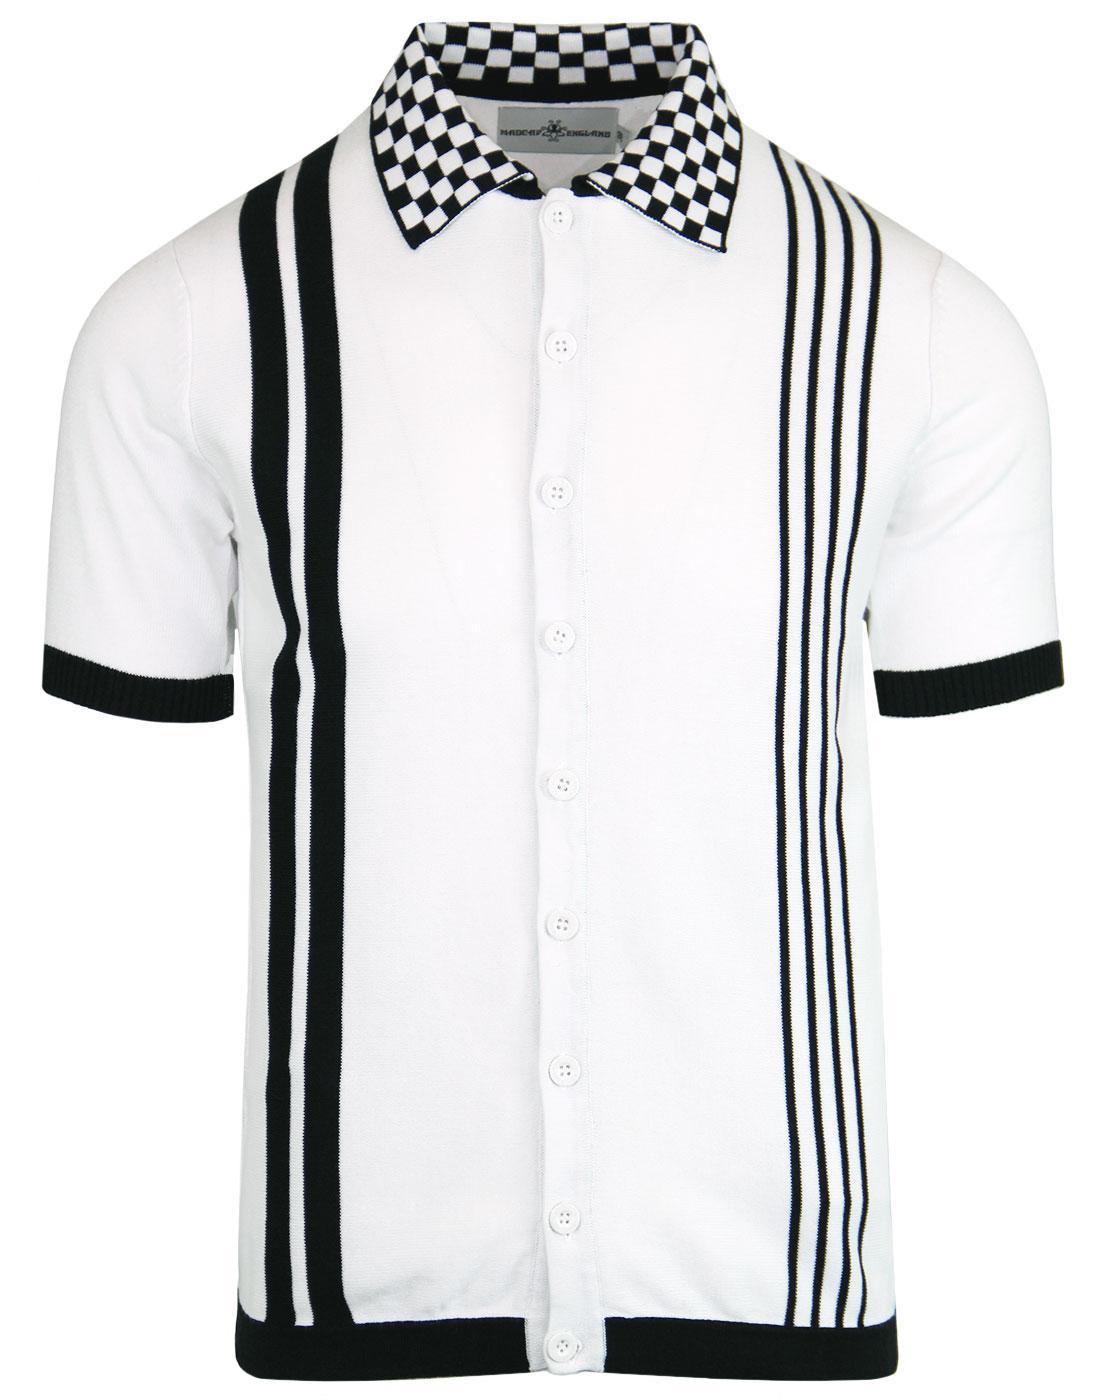 Charlie MADCAP ENGLAND Mod Check Collar Polo Shirt